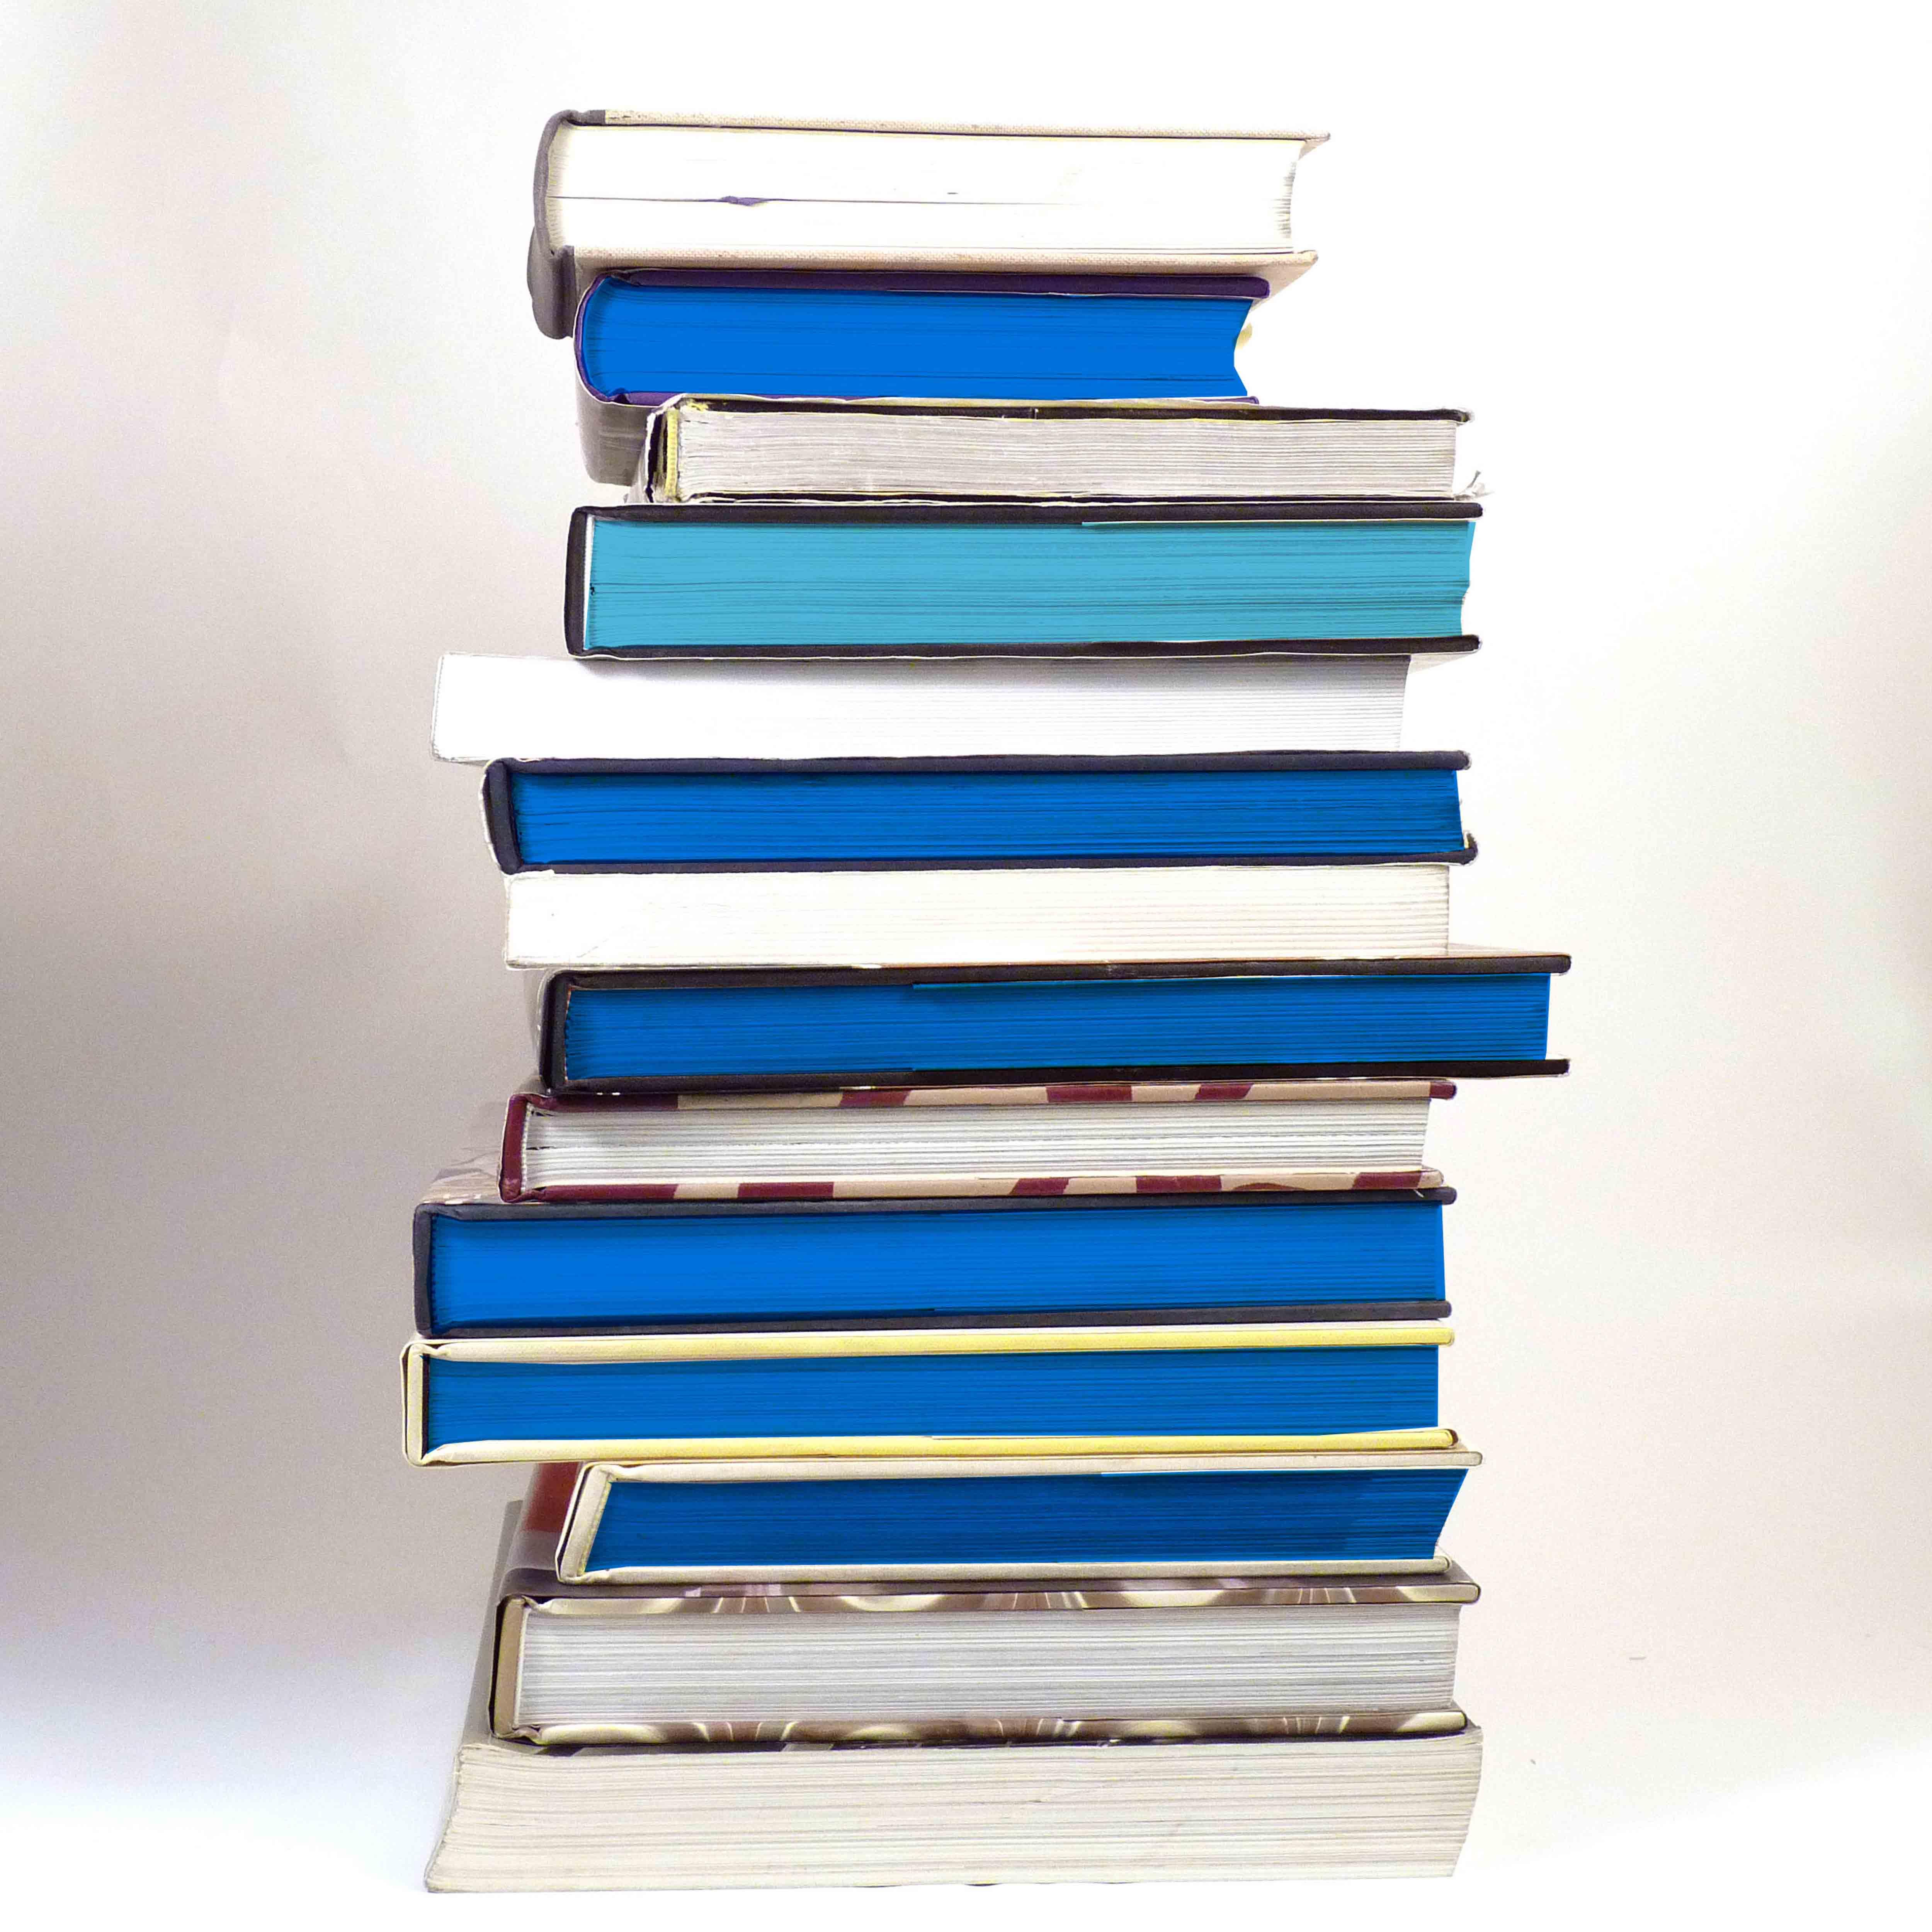 021 BLUE BOOKS